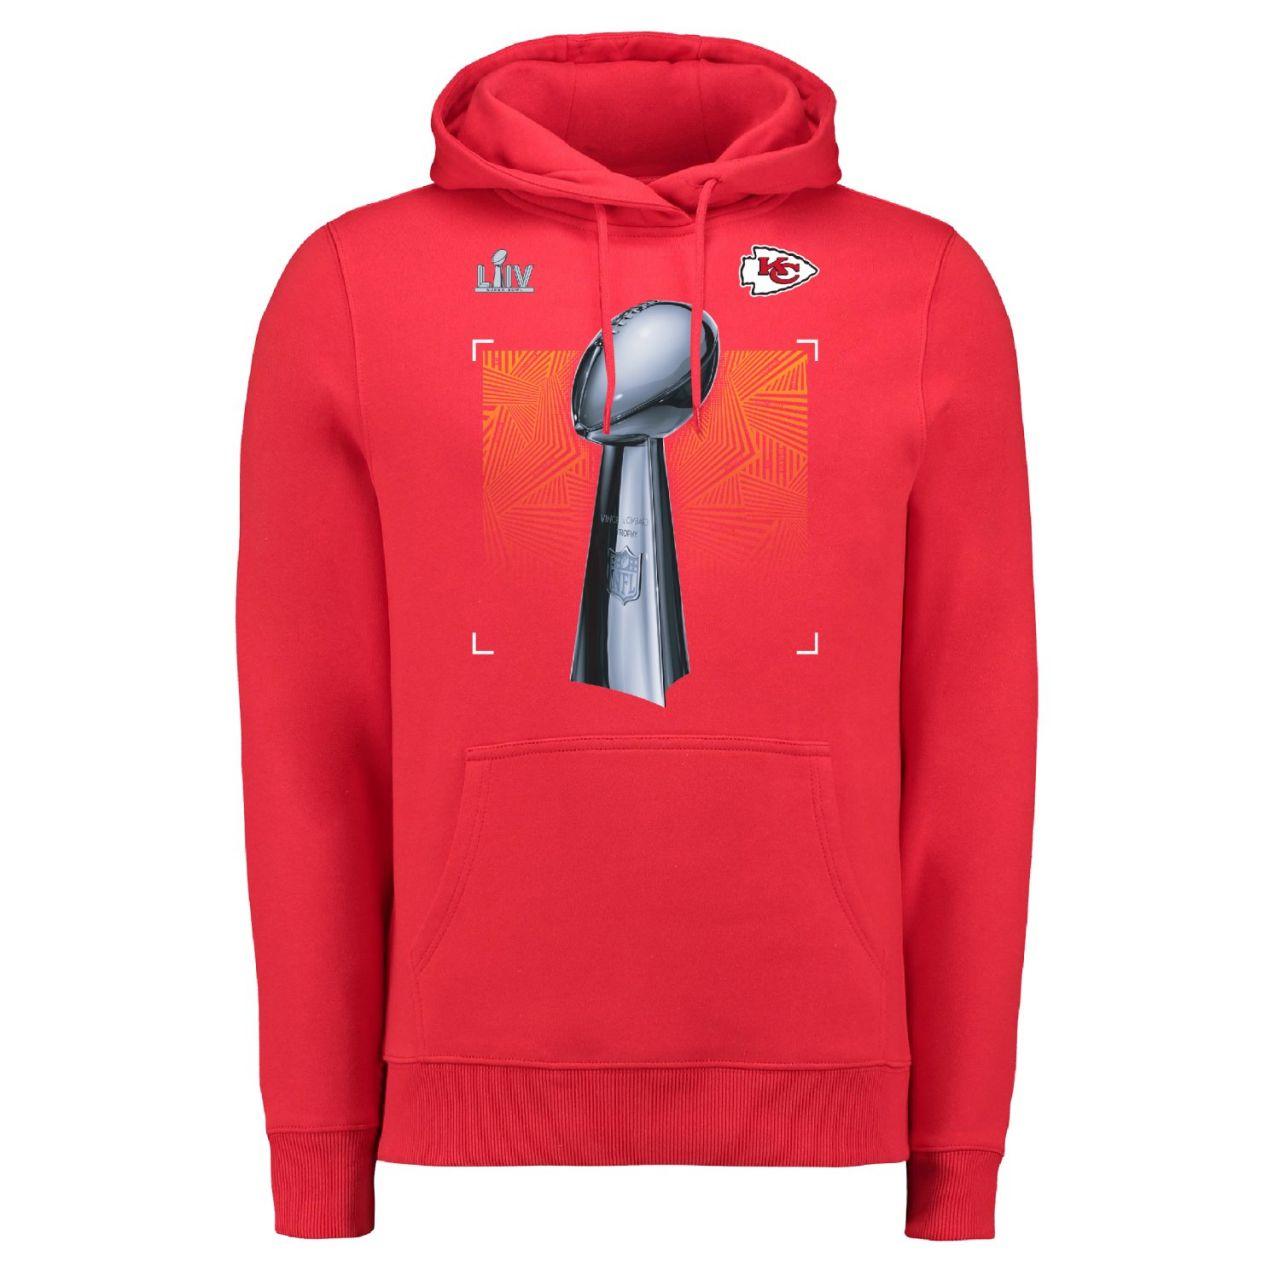 amfoo - Kansas City Chiefs Super Bowl LIV Champions Parade Hoody